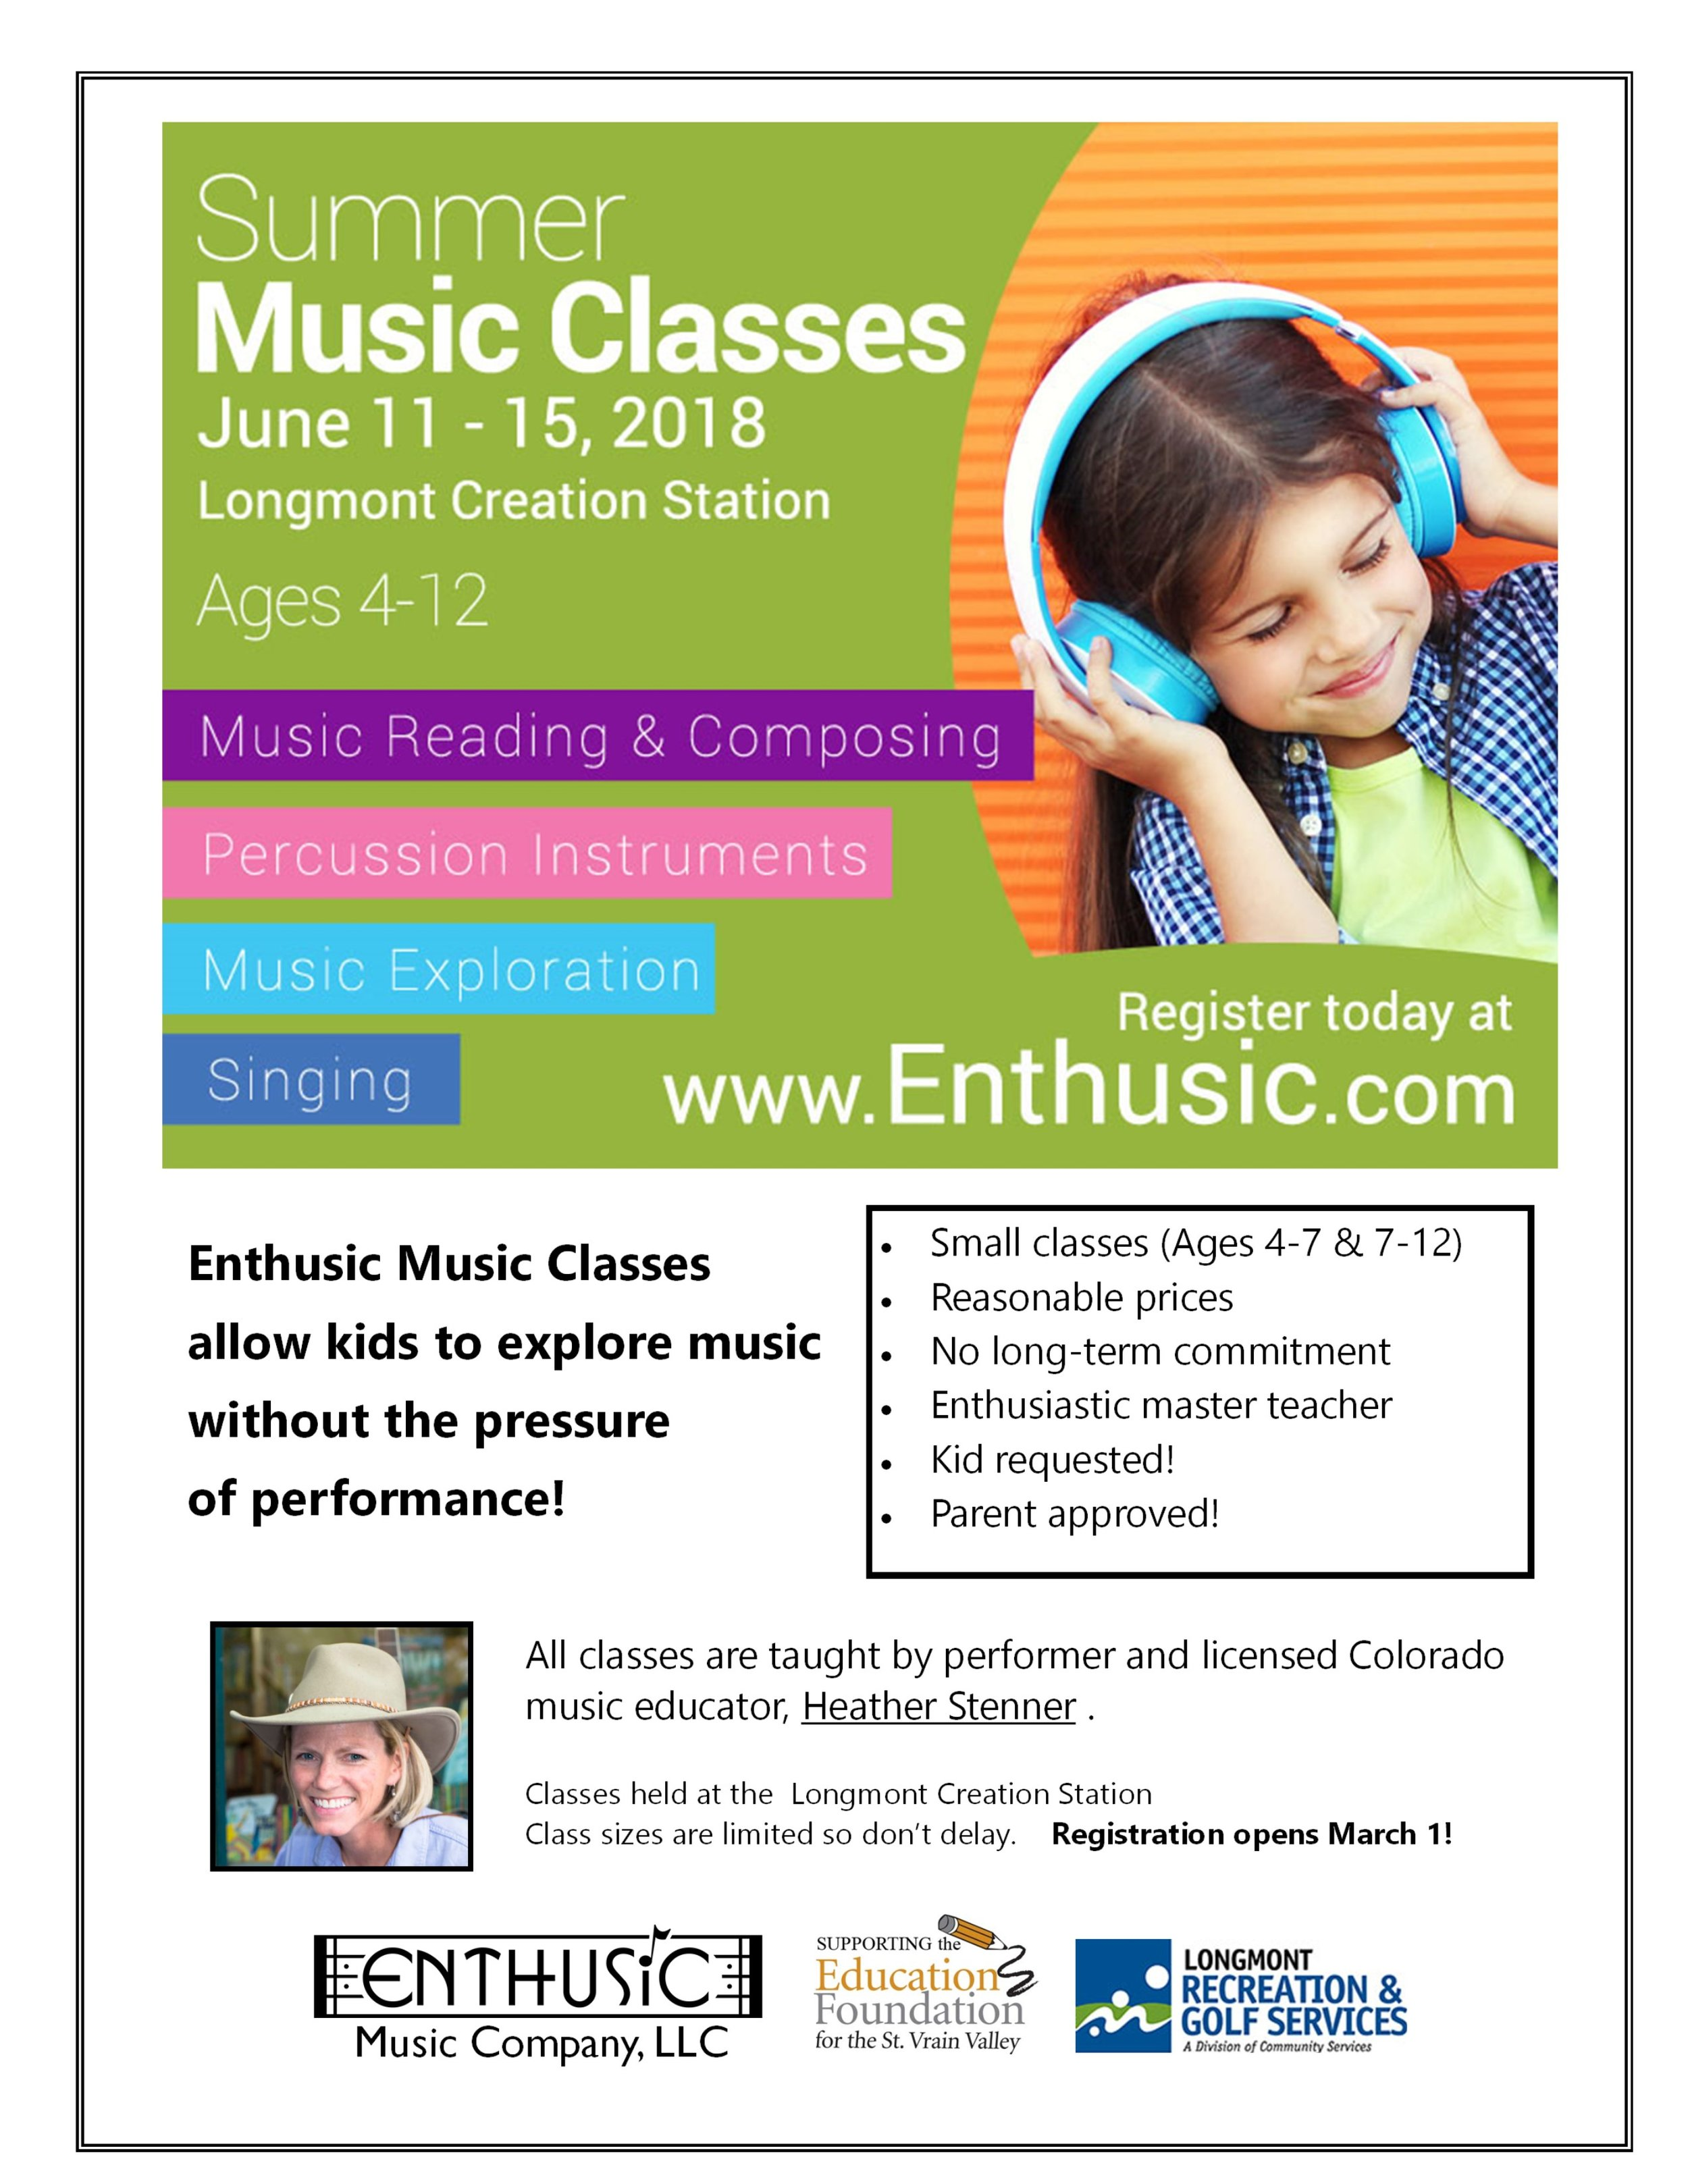 Enthusic Music Summer Classes.jpg